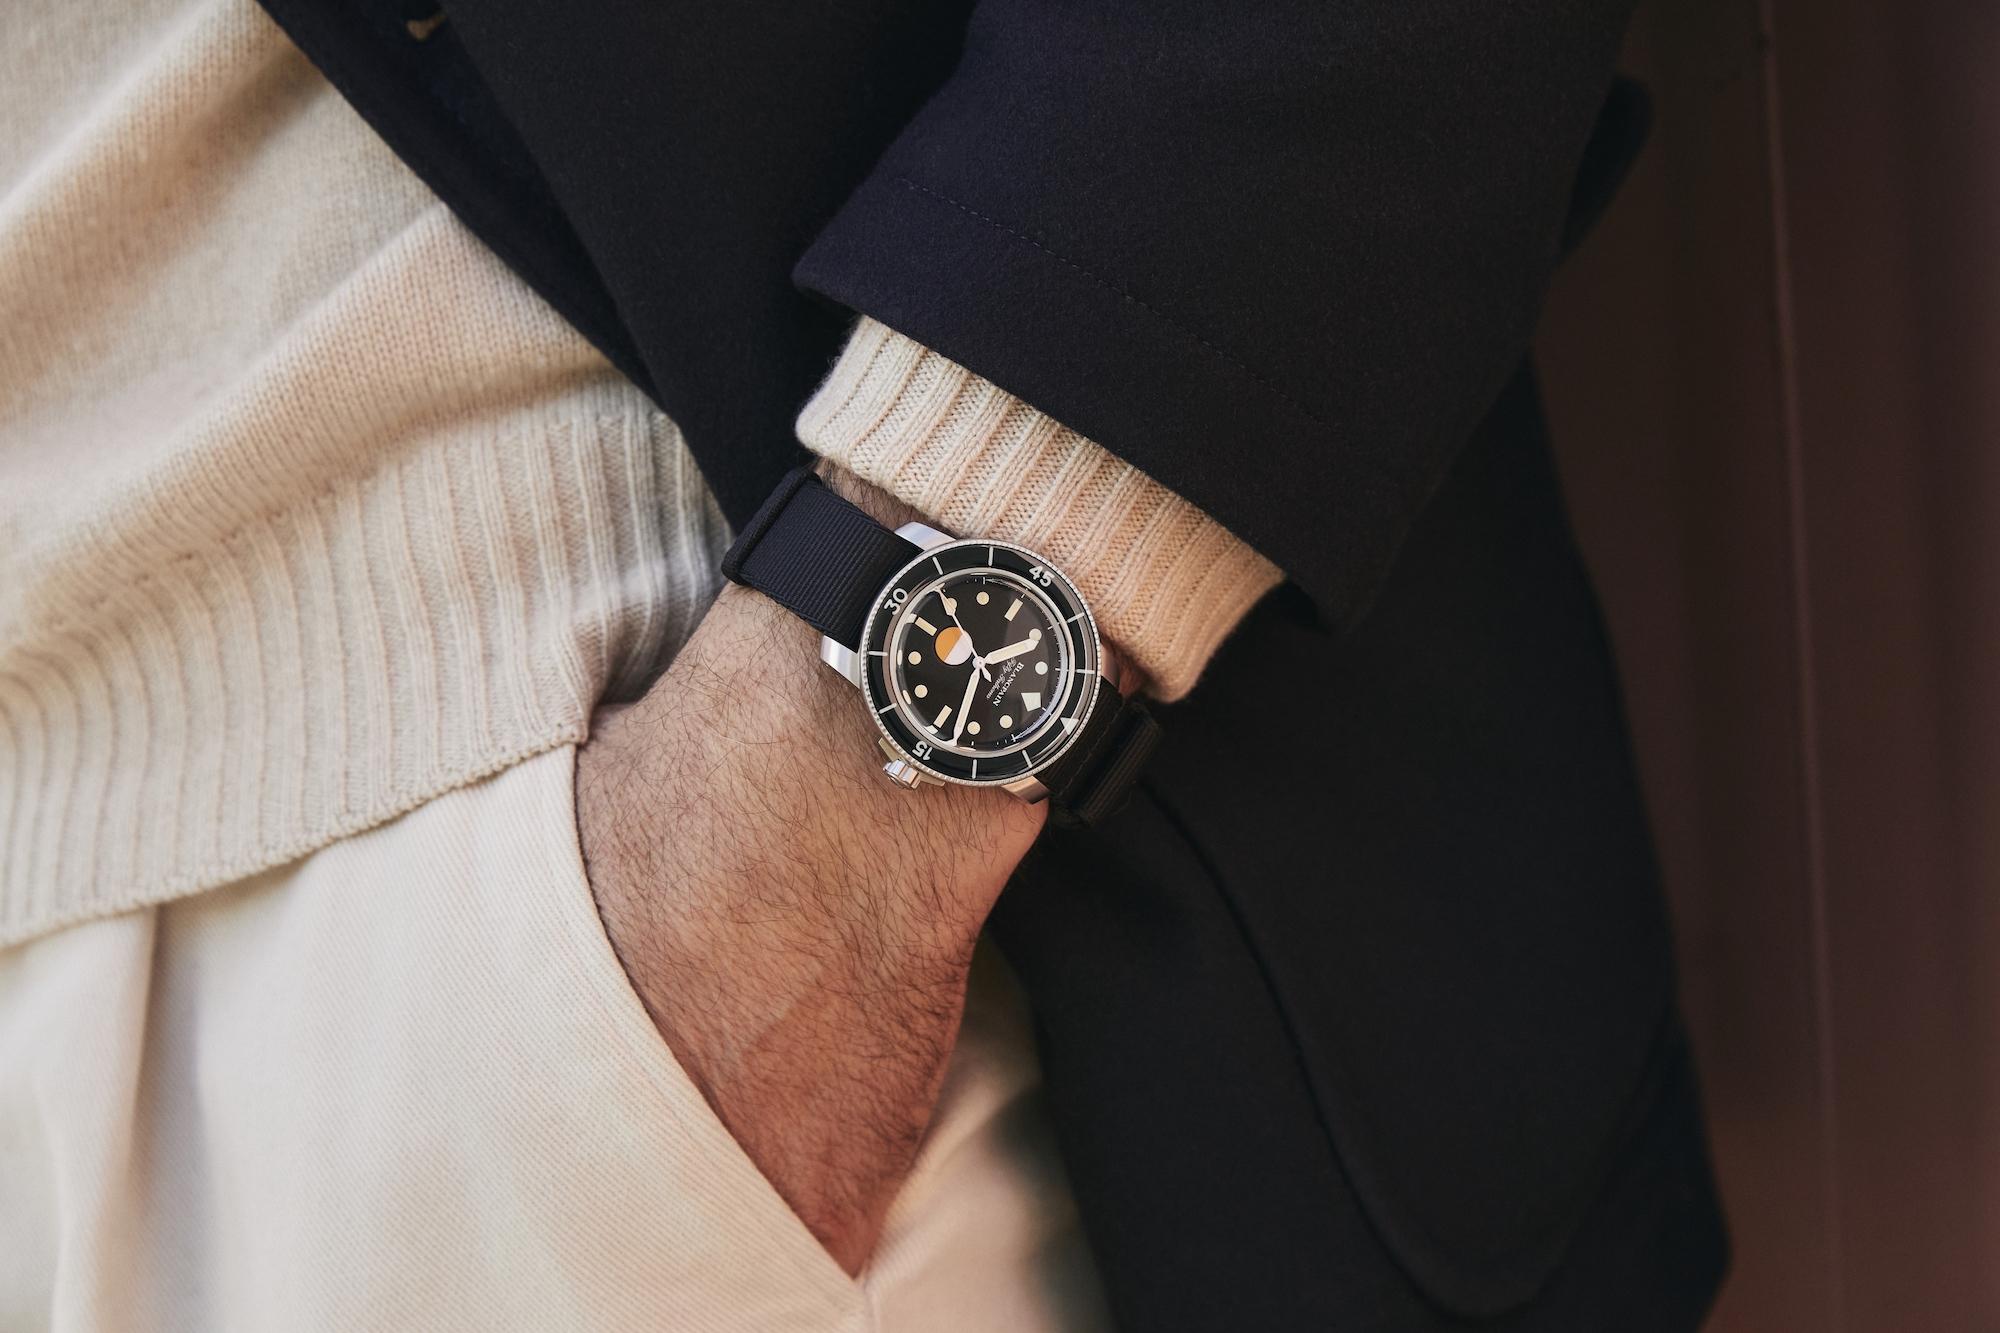 Blancpain Fifty Fathoms MIL-SPEC Hodinkee lifestyle wristshot